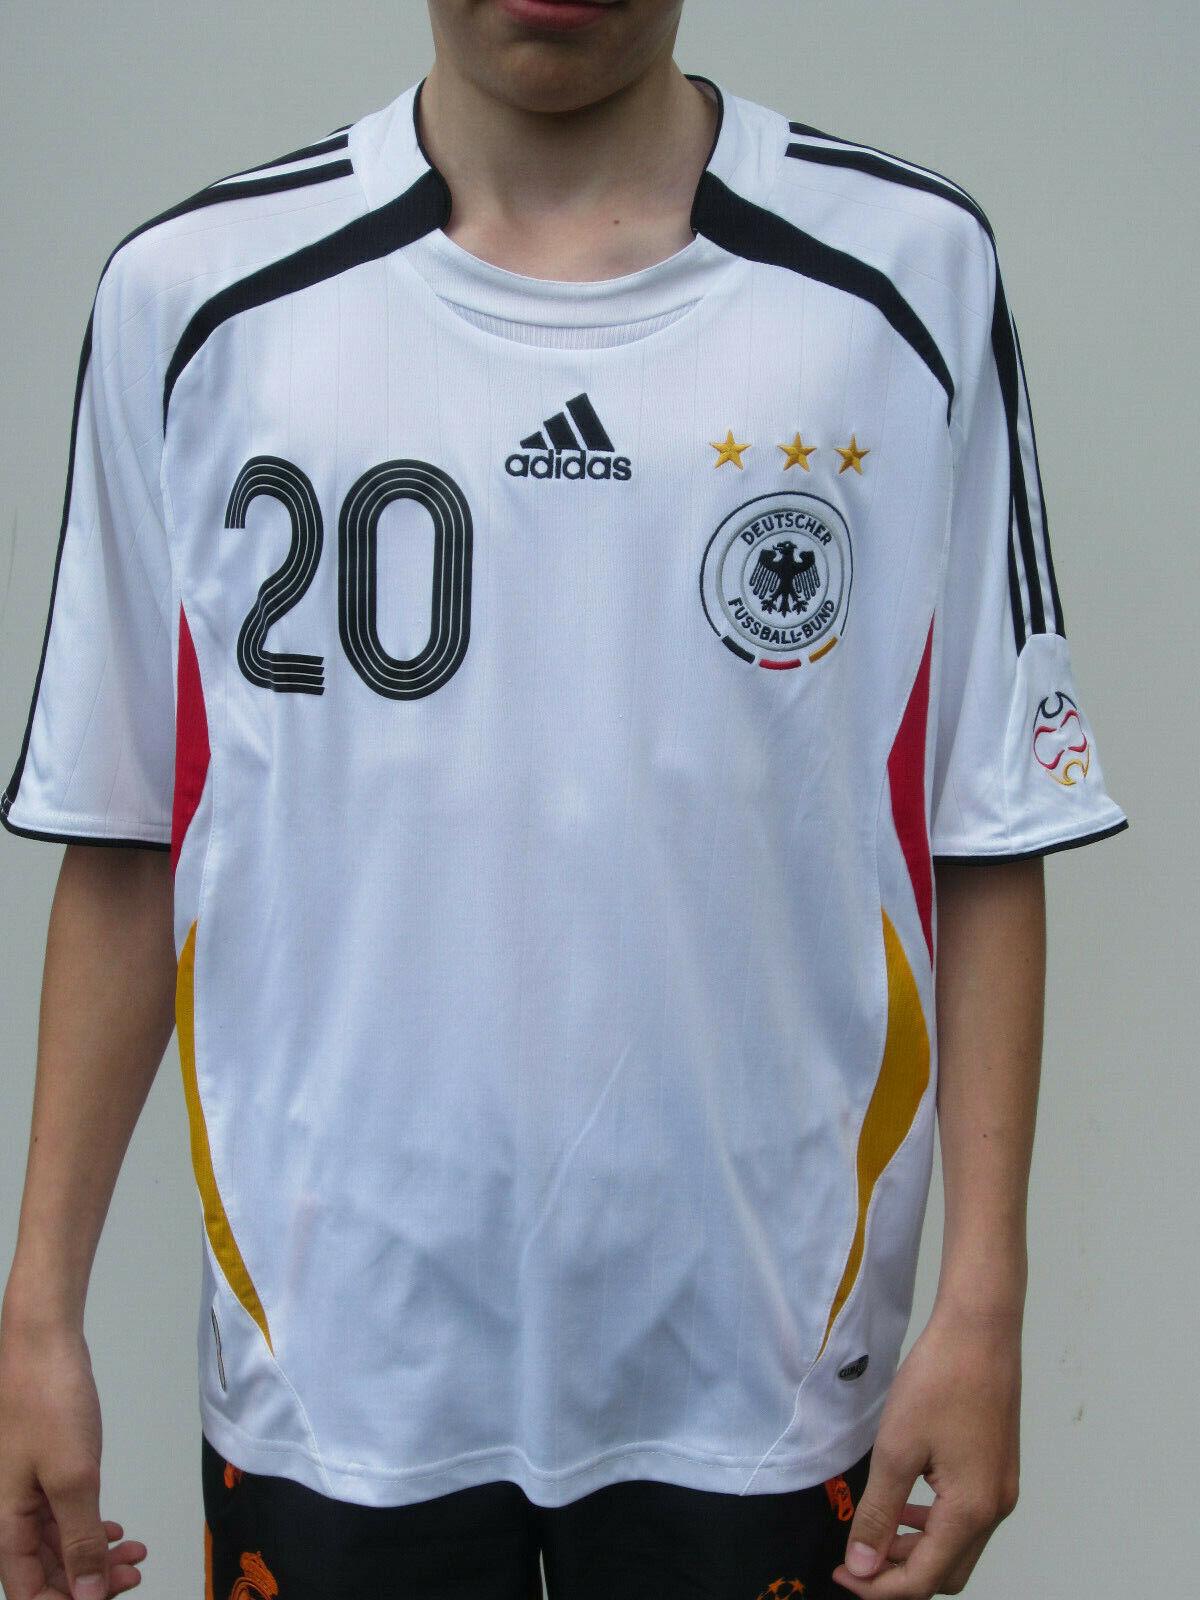 Adidas DFB Alemania Podolski 20 [Tamaño 164] WM 2006 Niños Camiseta Local (2)